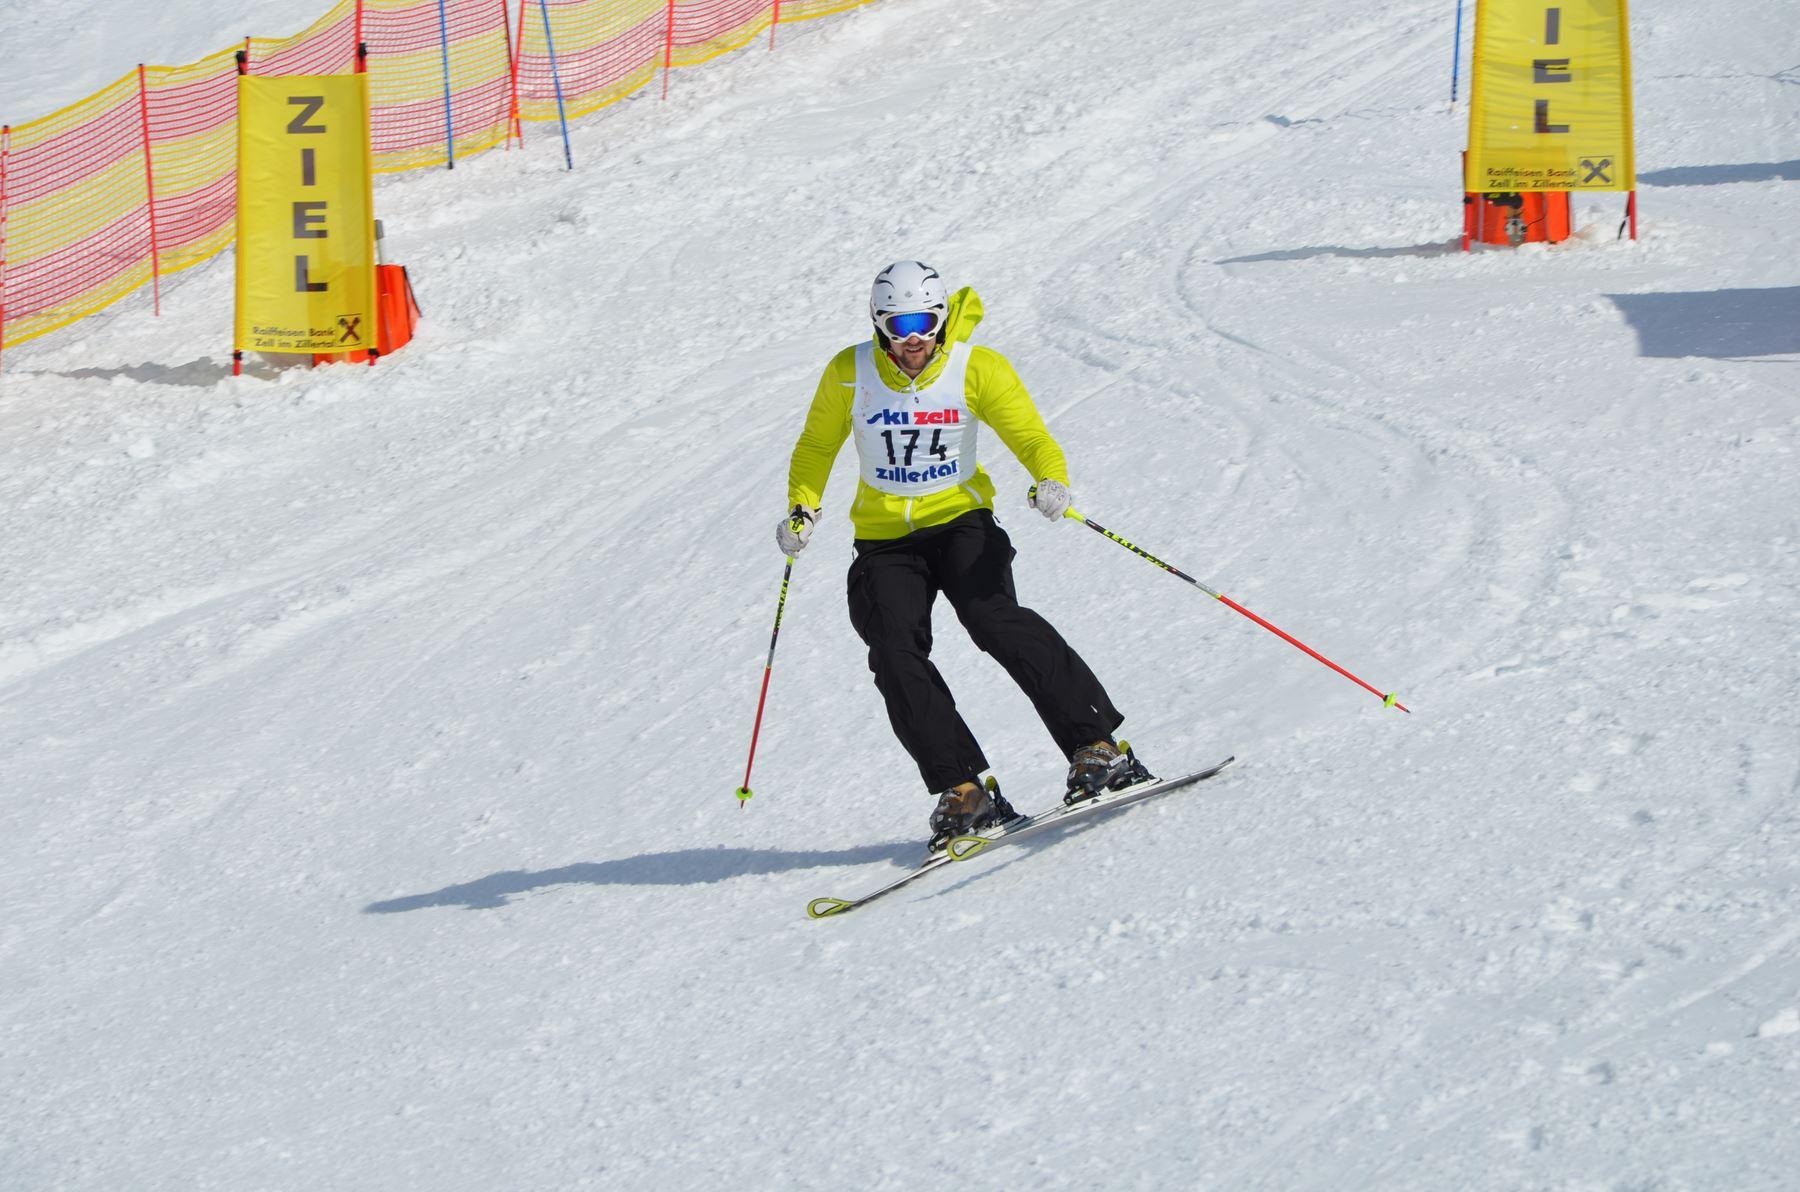 2015-03-22 BV Zillertal Skirennen 293.JPG